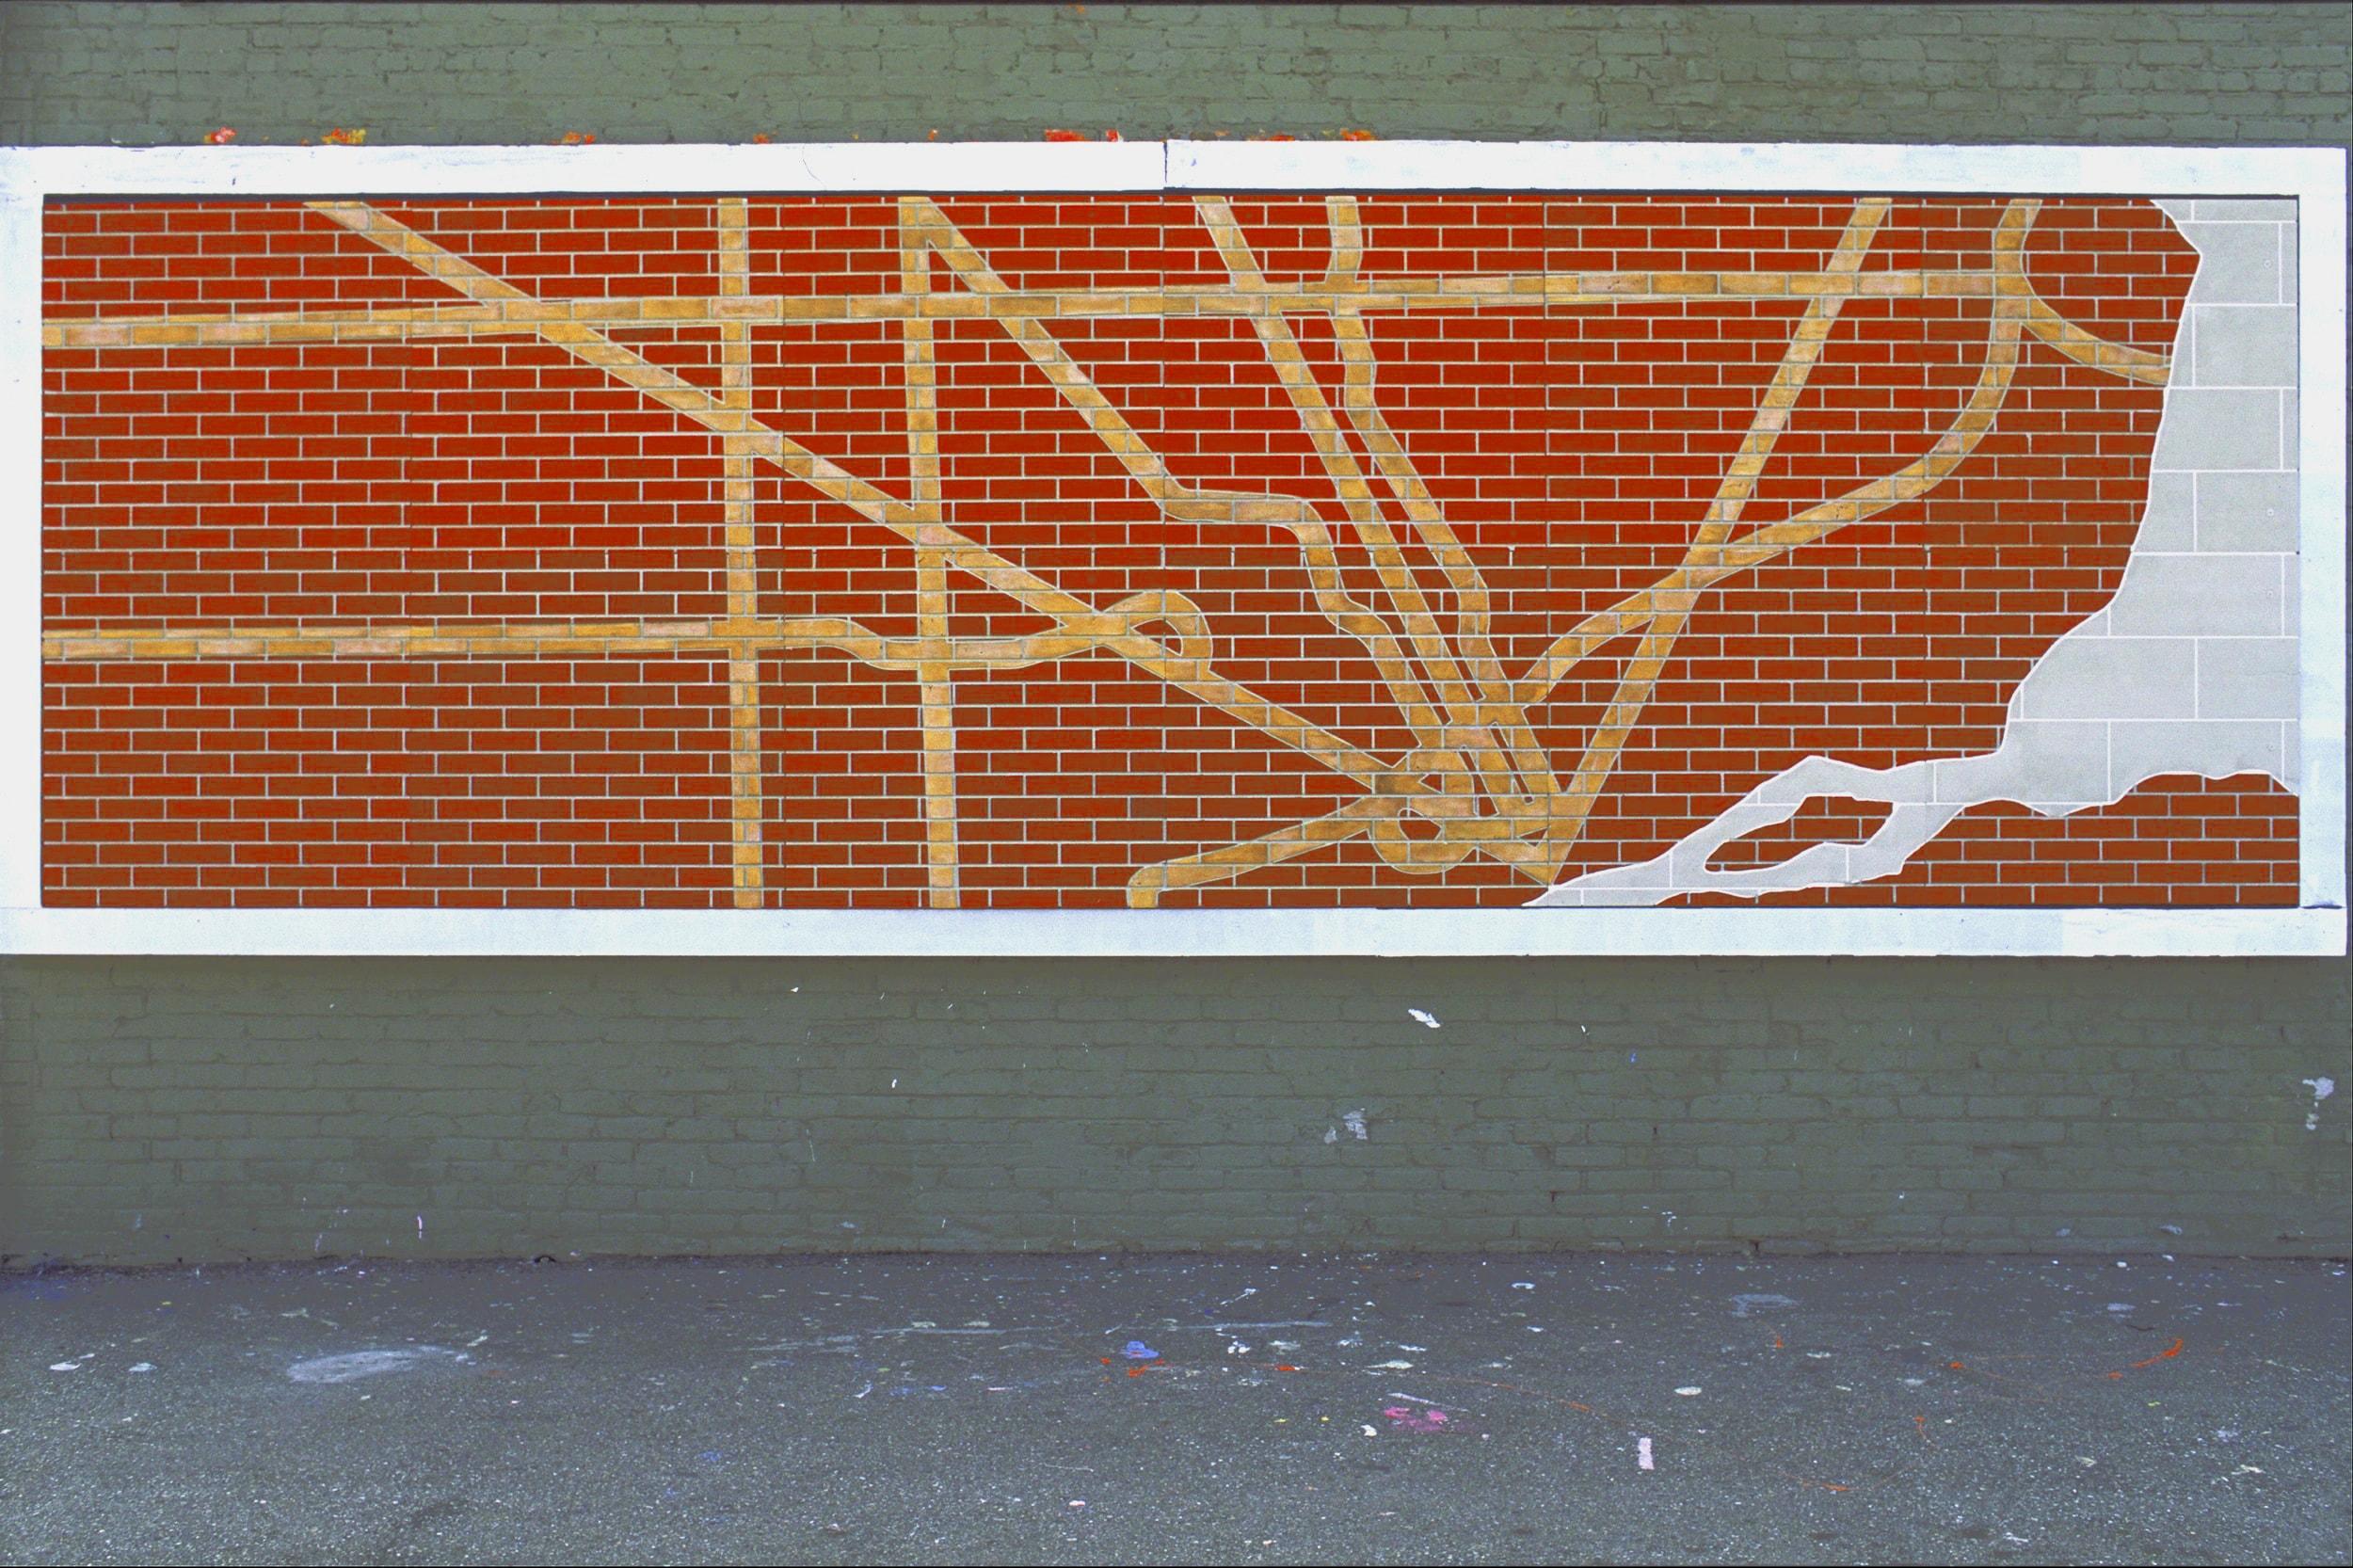 The Public Art Project: Billboard (detail)